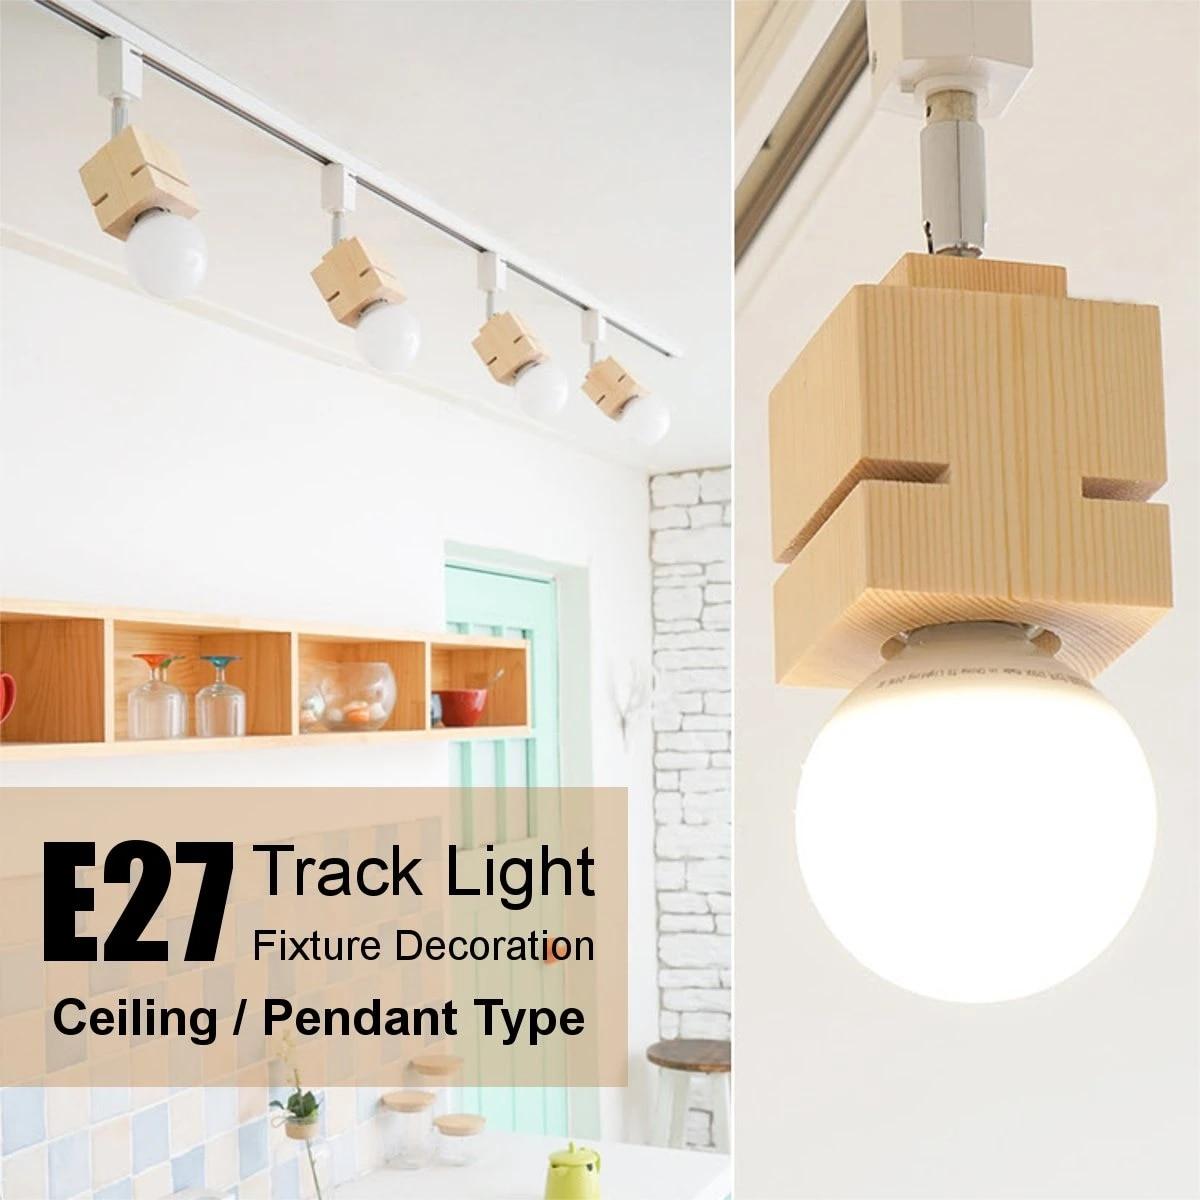 E27 Track Light Ceiling Pendant Lamp Home Bedroom Chandelier Fixture Decoration Home Bar Track Lighting Pendant Lights 85 265v Track Lighting Aliexpress